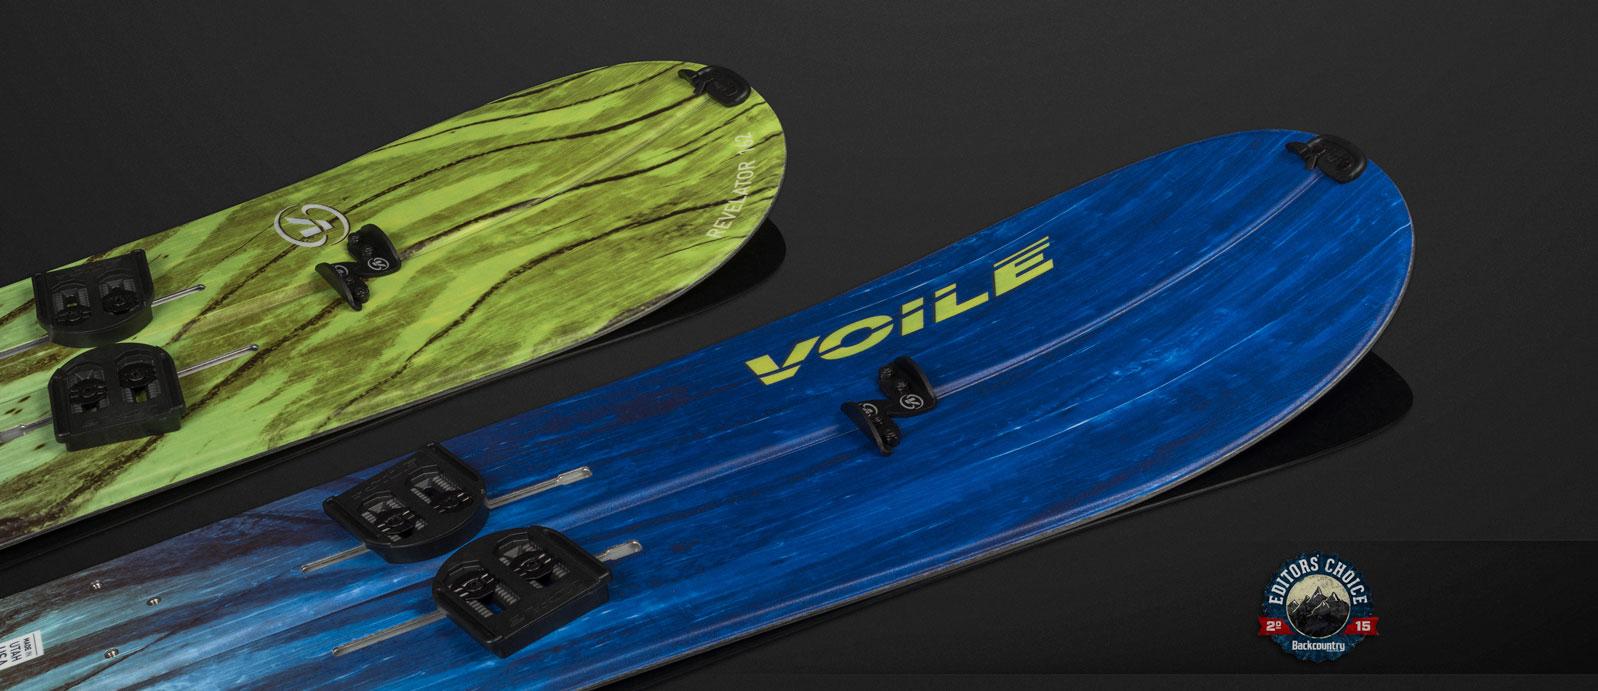 Voile Revelator Splitboard